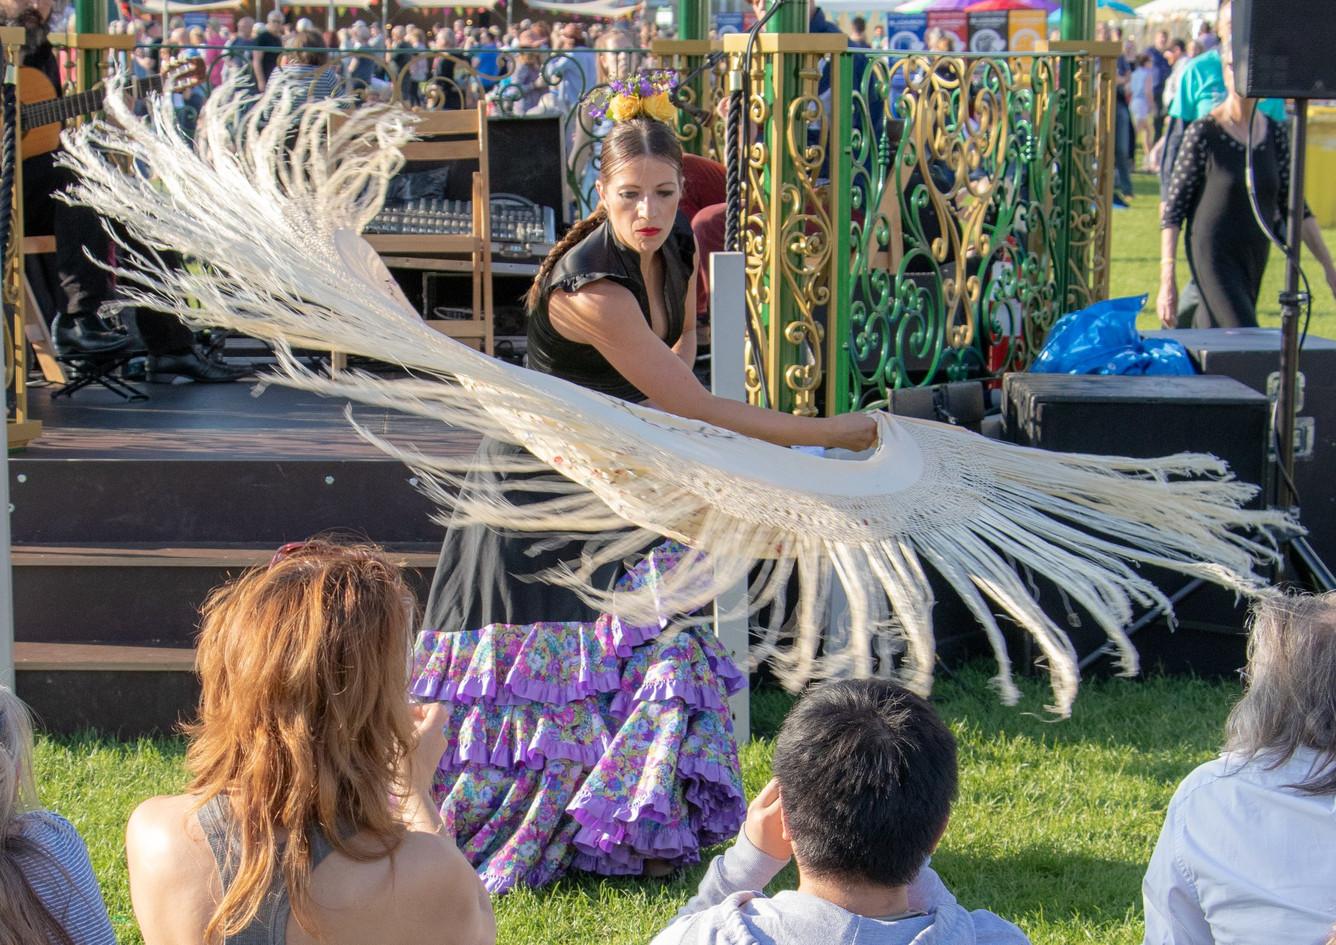 Bath Finale Festival